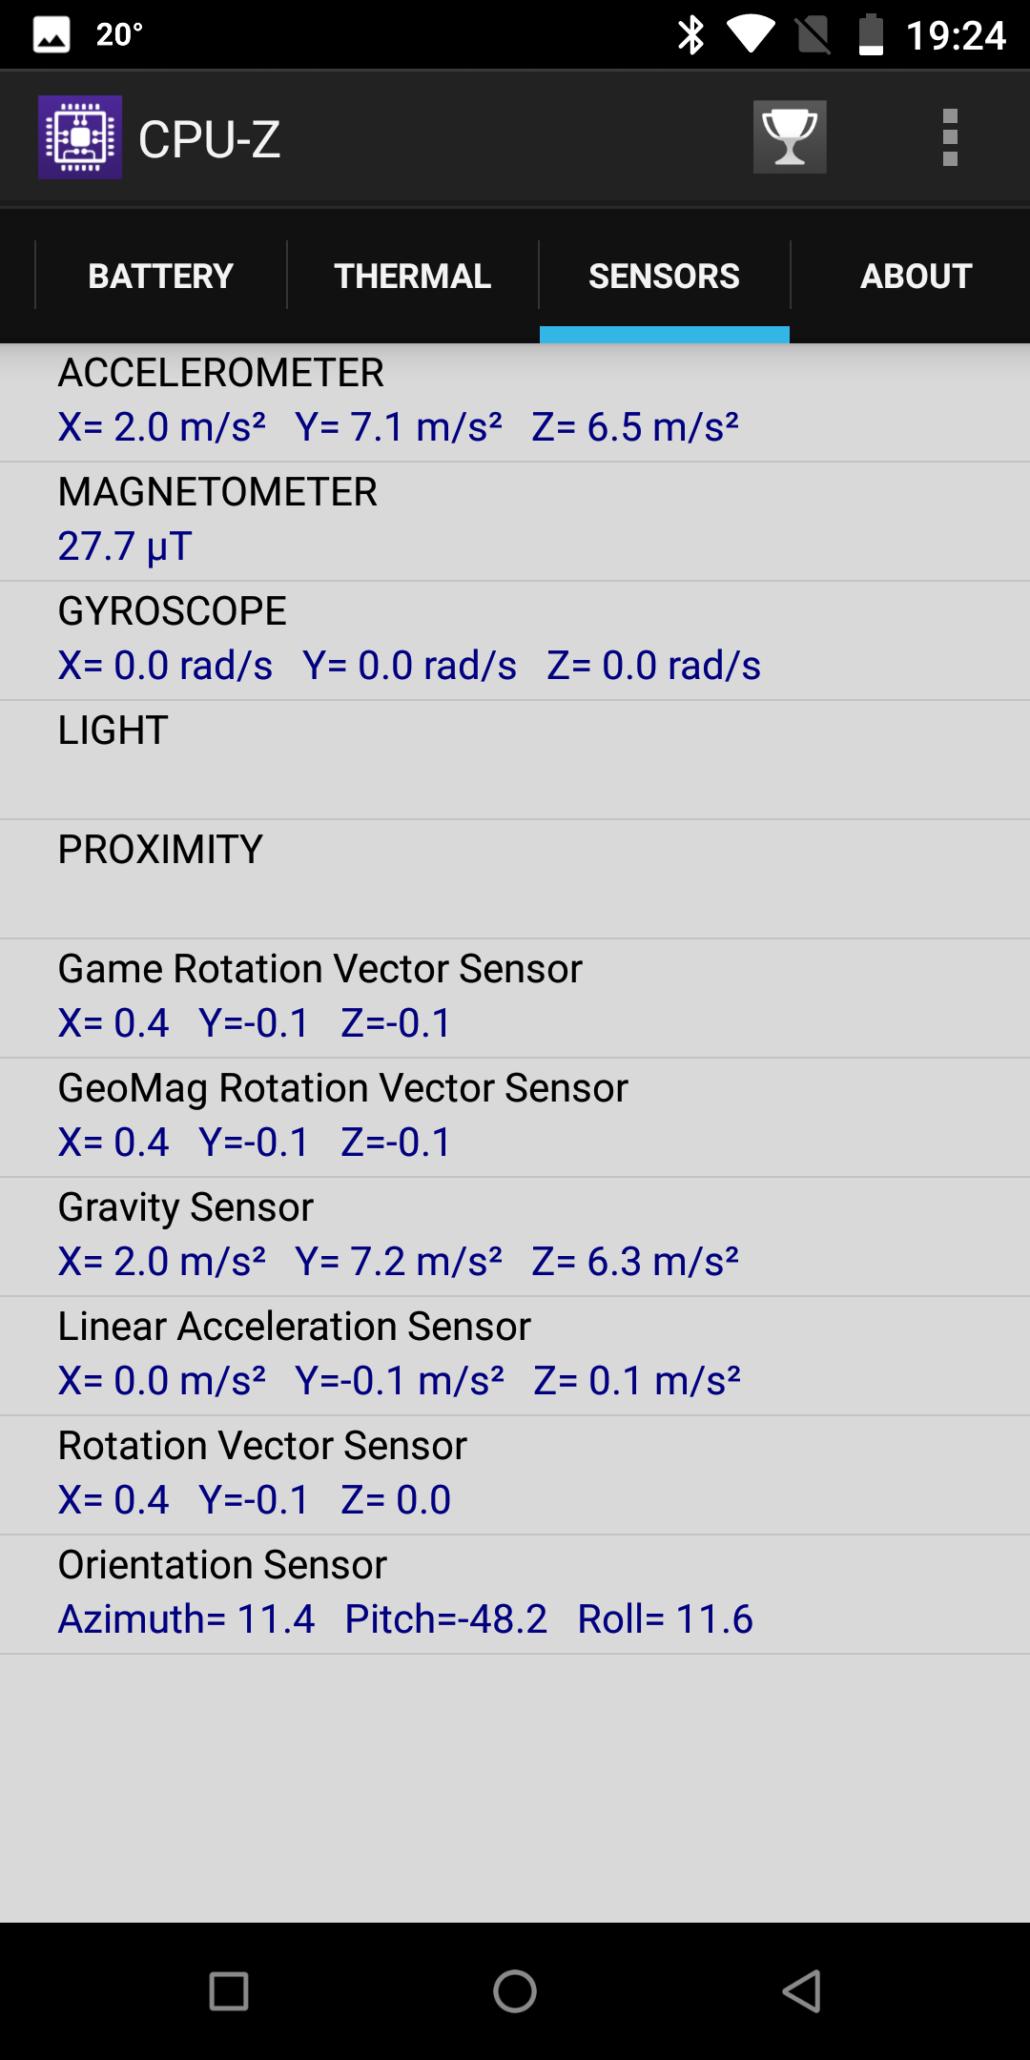 oukitel-k7-phone-review-02-part-6-cpuz-sensors